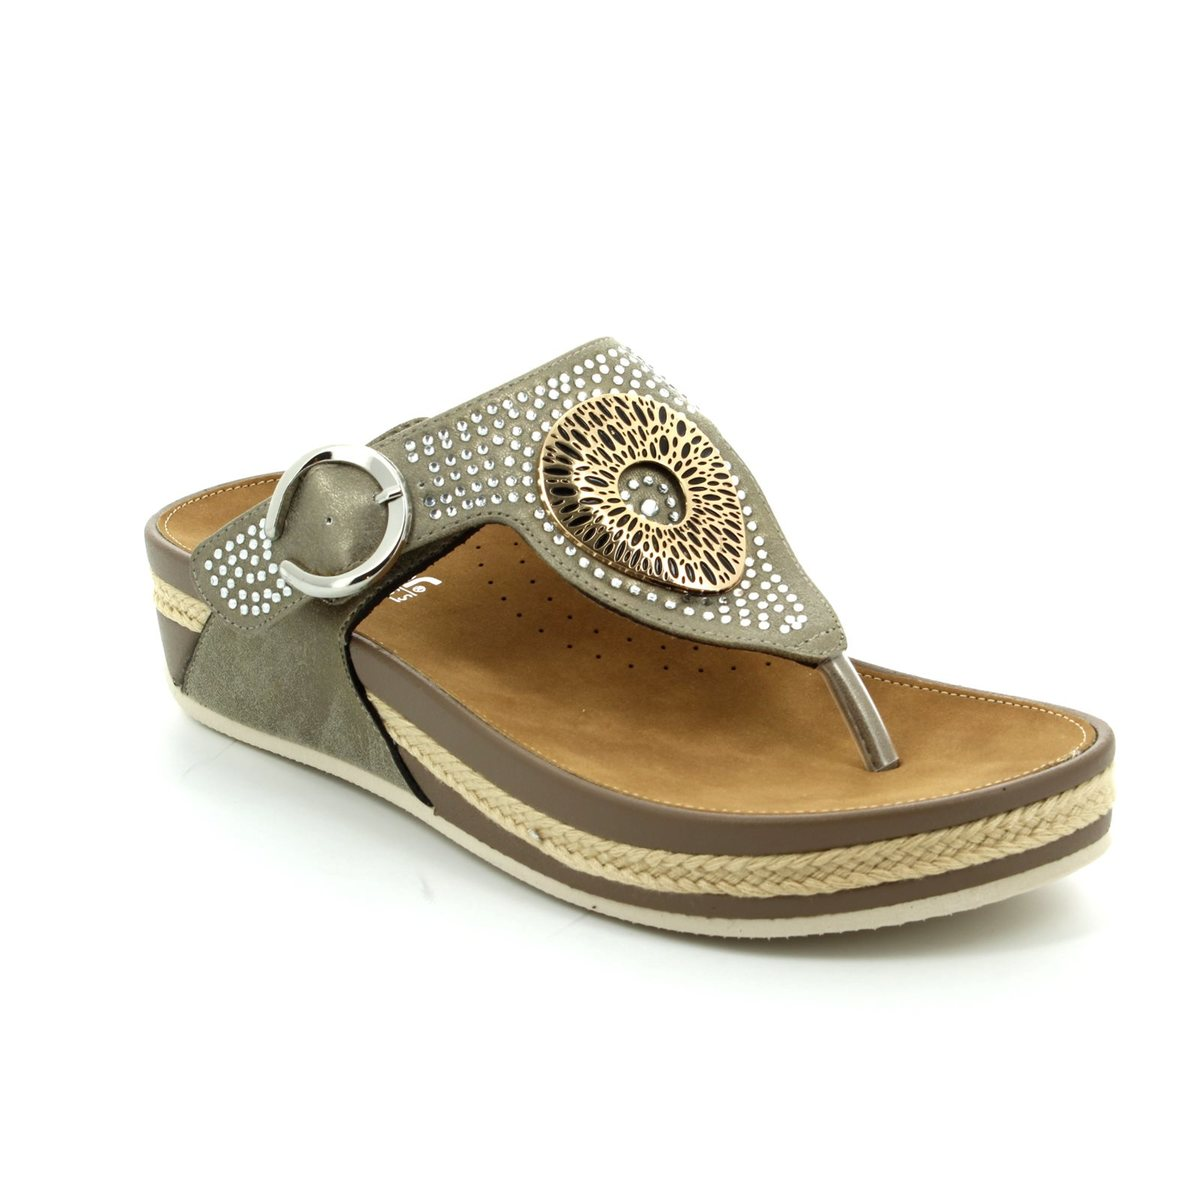 53fe85b9b5 Rieker Sandals - META - V1460-62 LULU